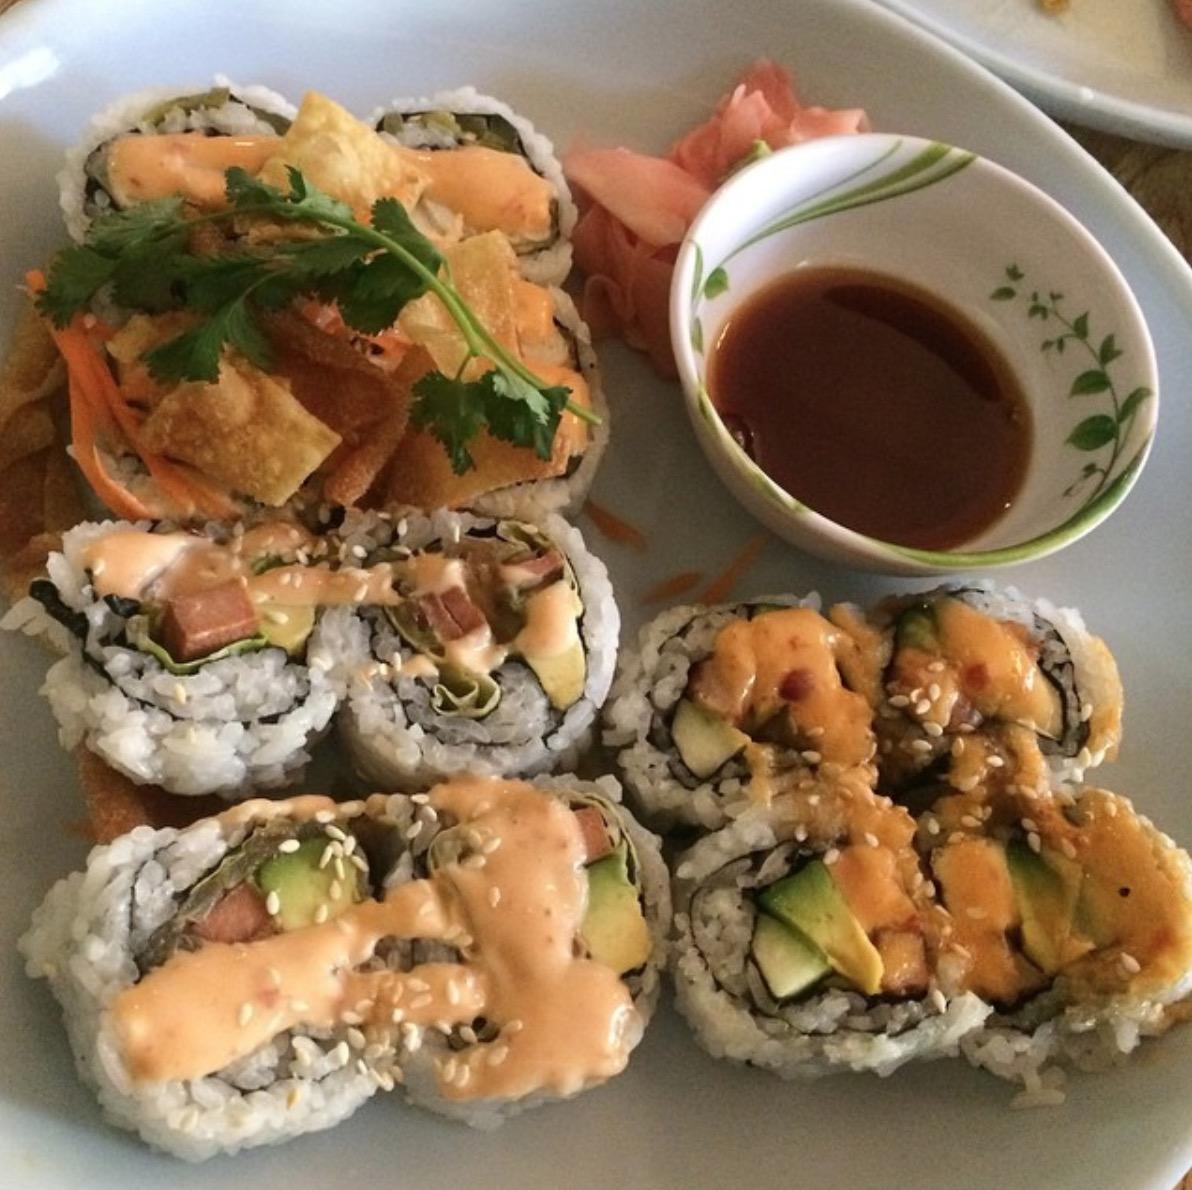 Image via Sipz Vegetarian Fusion Cafe